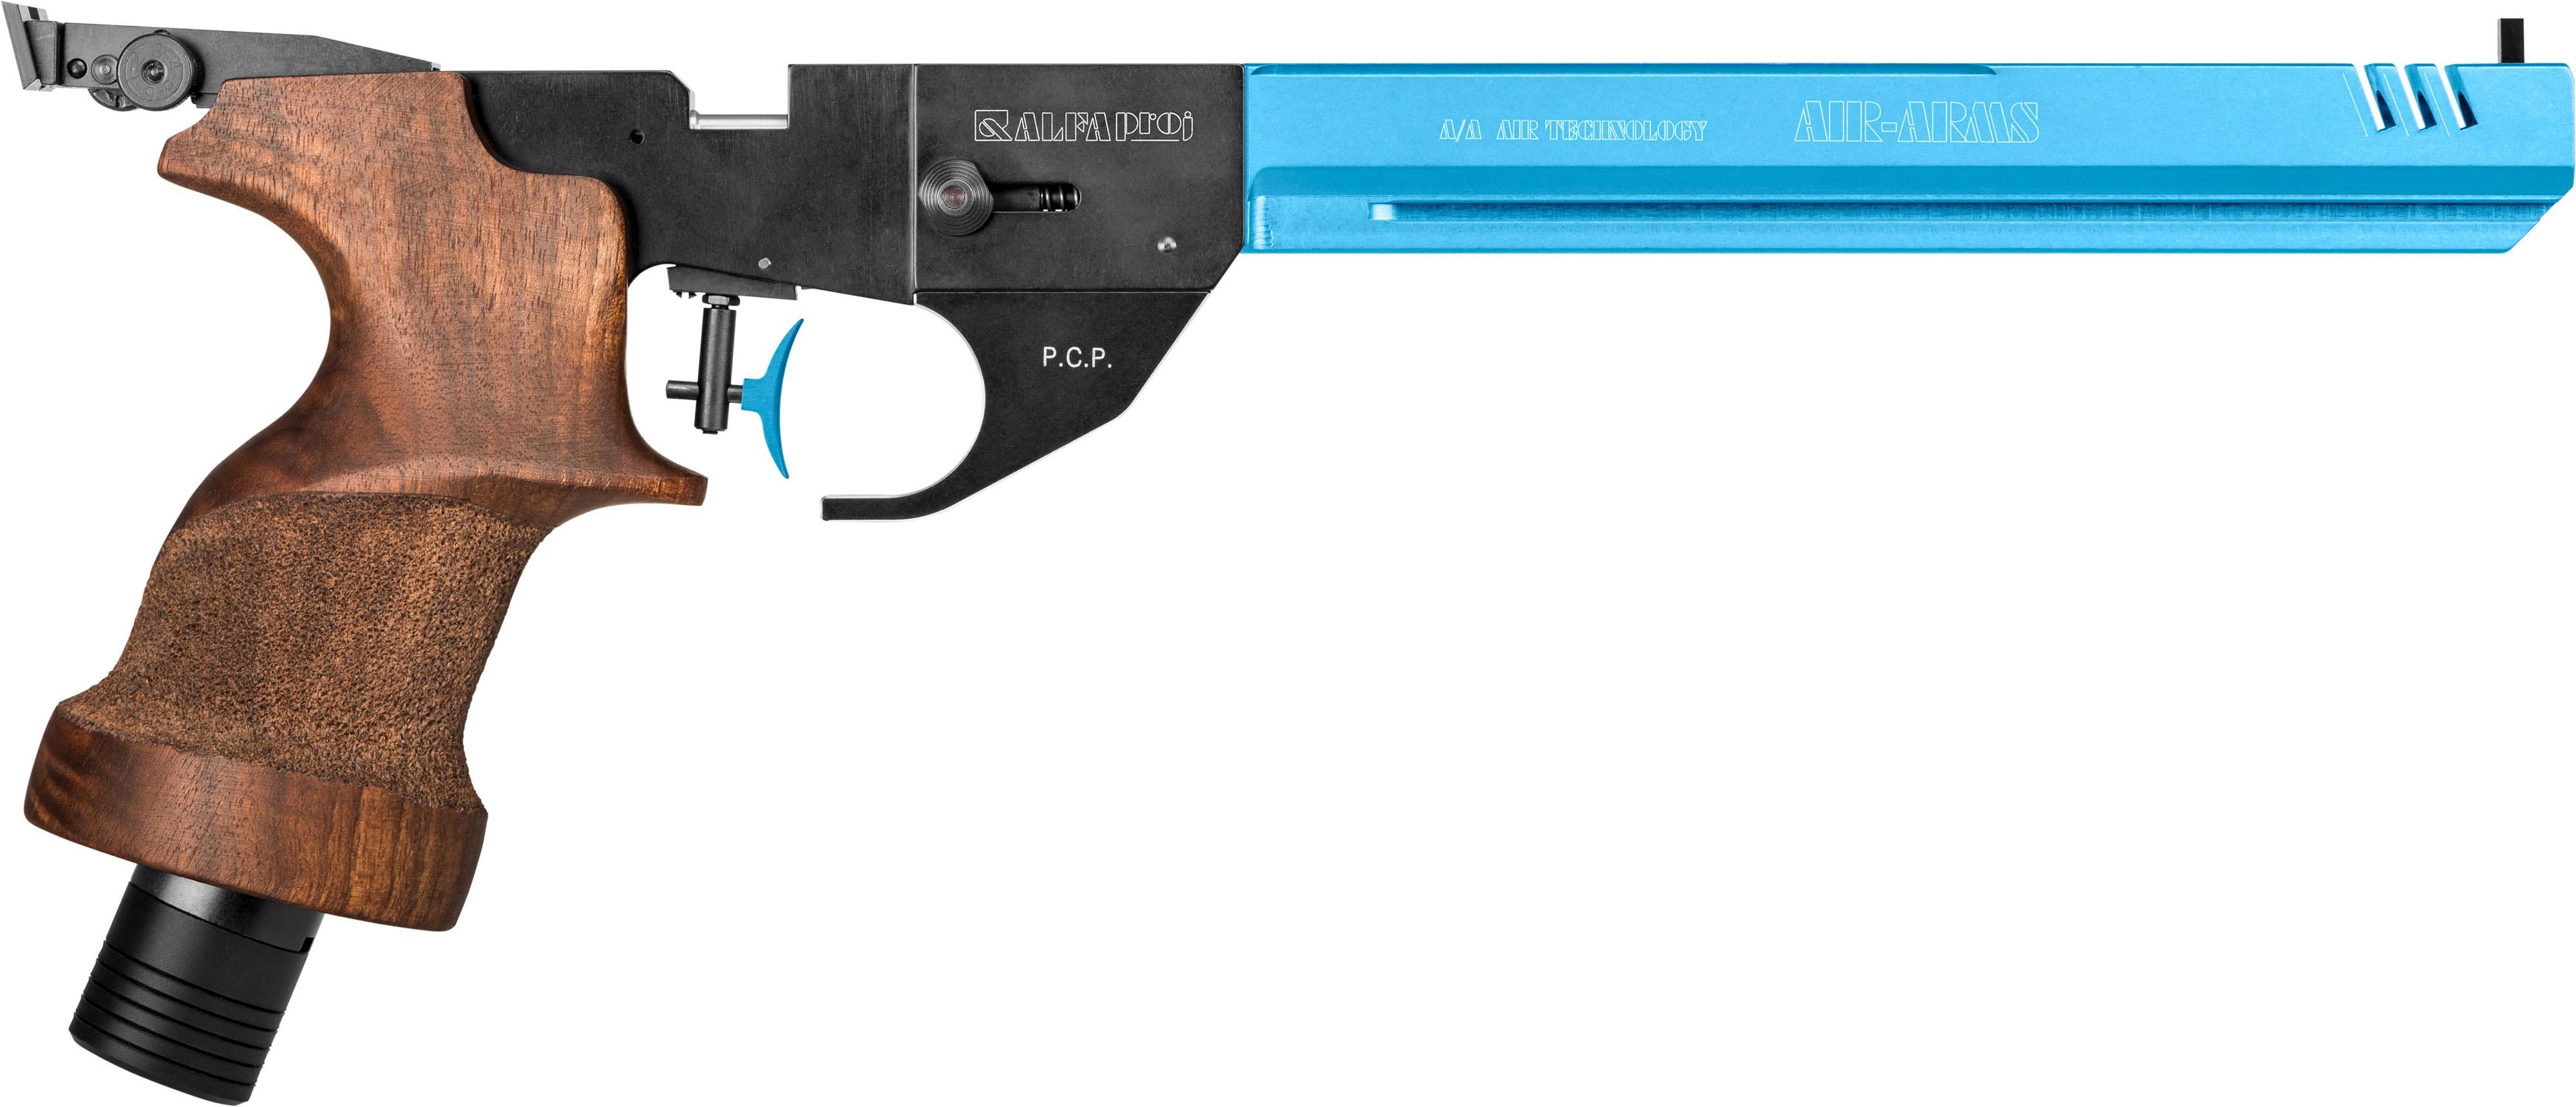 Alfa Sport Pistol - Target Rifles | Air Arms